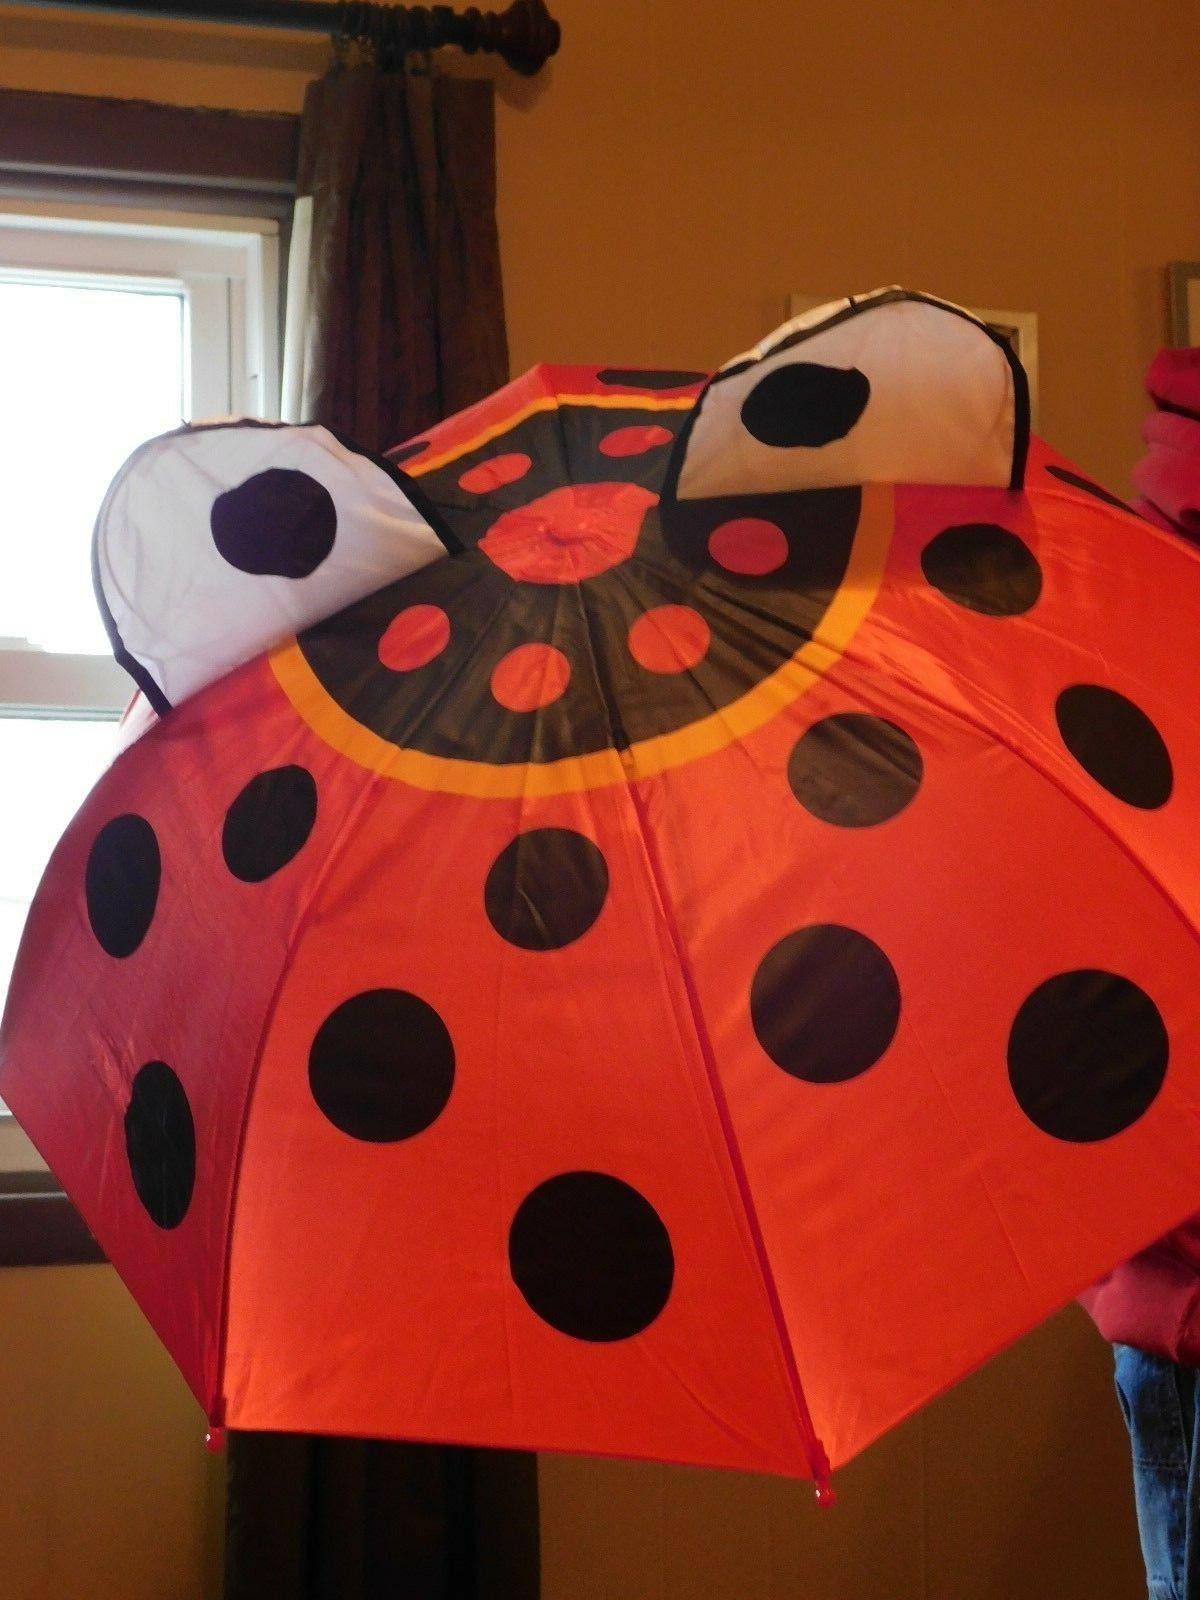 NEW RAINSTOPPERS LADY BUG  DESIGN CHILDREN'S UMBRELLA